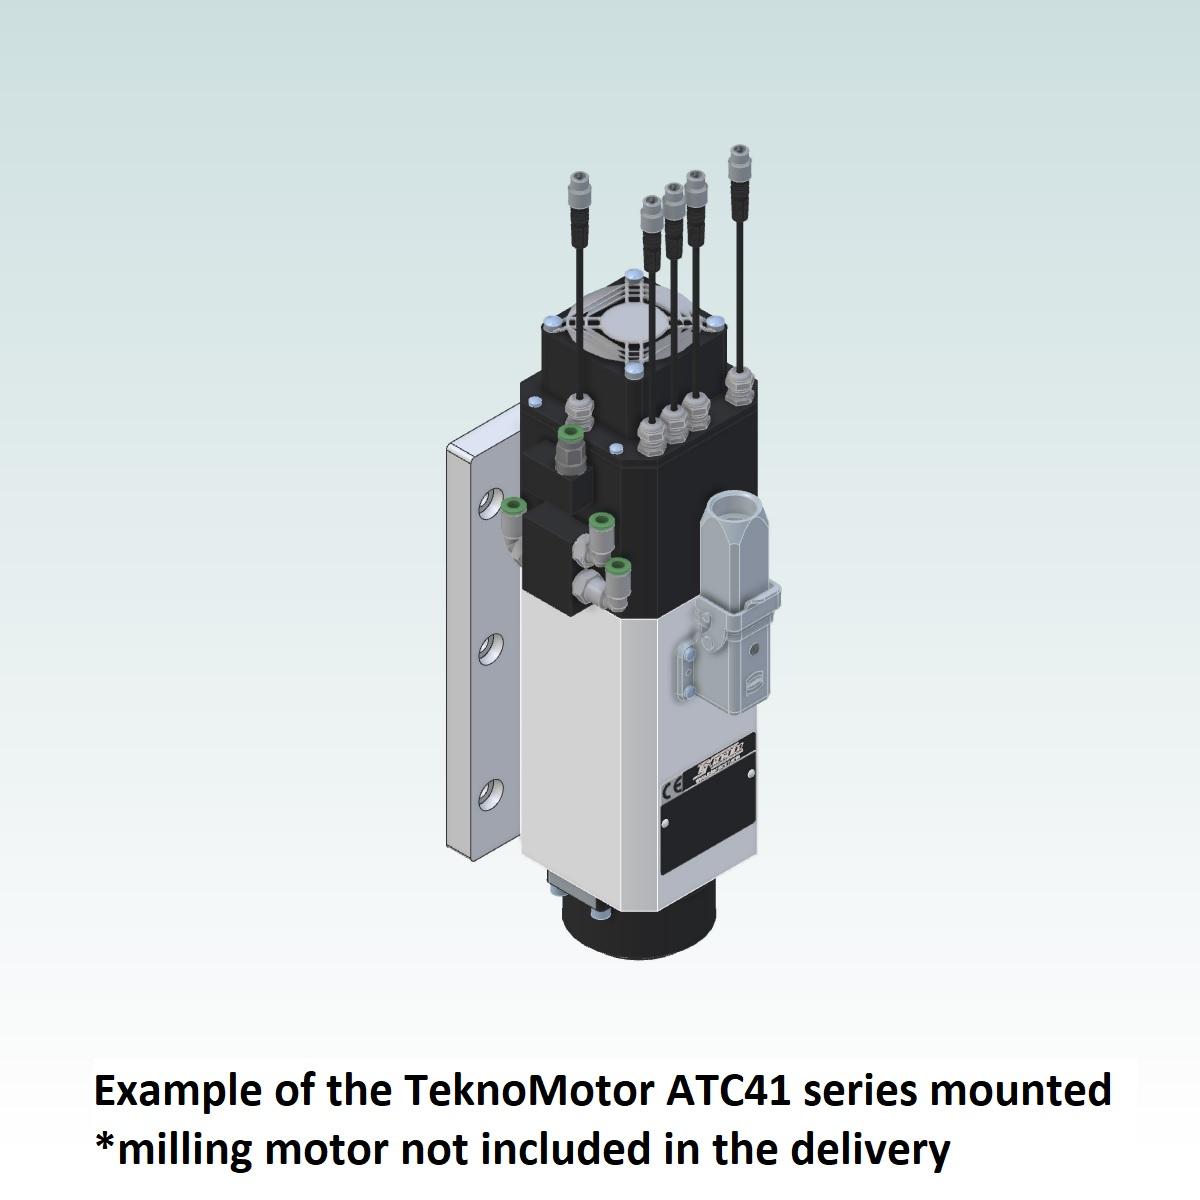 42712 teknomotor mountingplate icp4030 example with teknomotor atc41 mounted